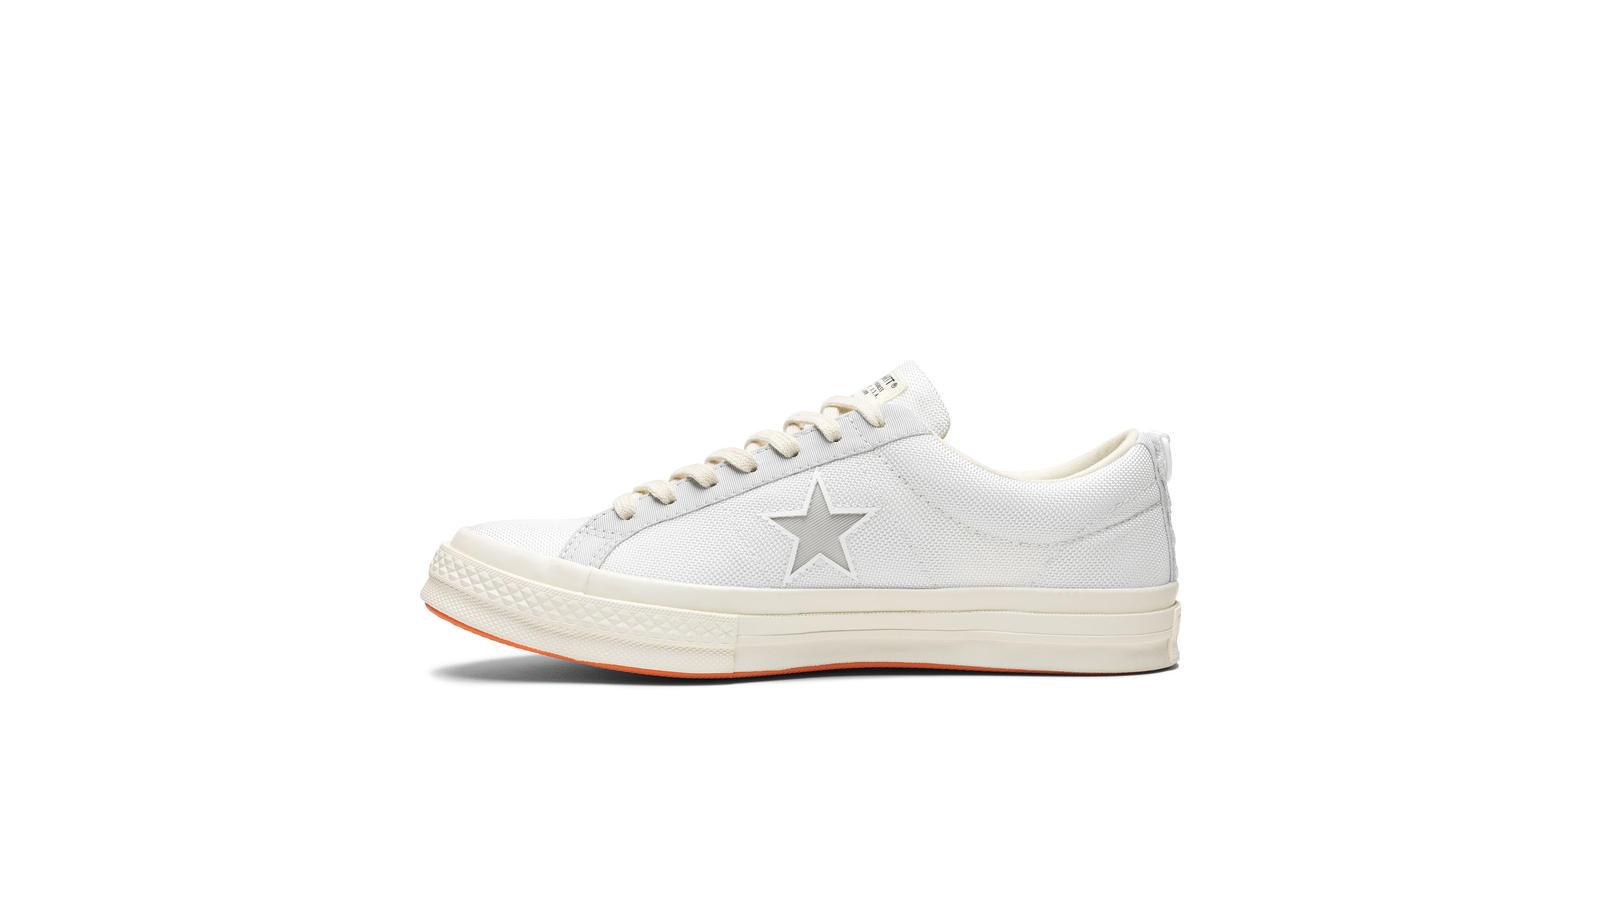 Converse x Carhartt WIP One Star